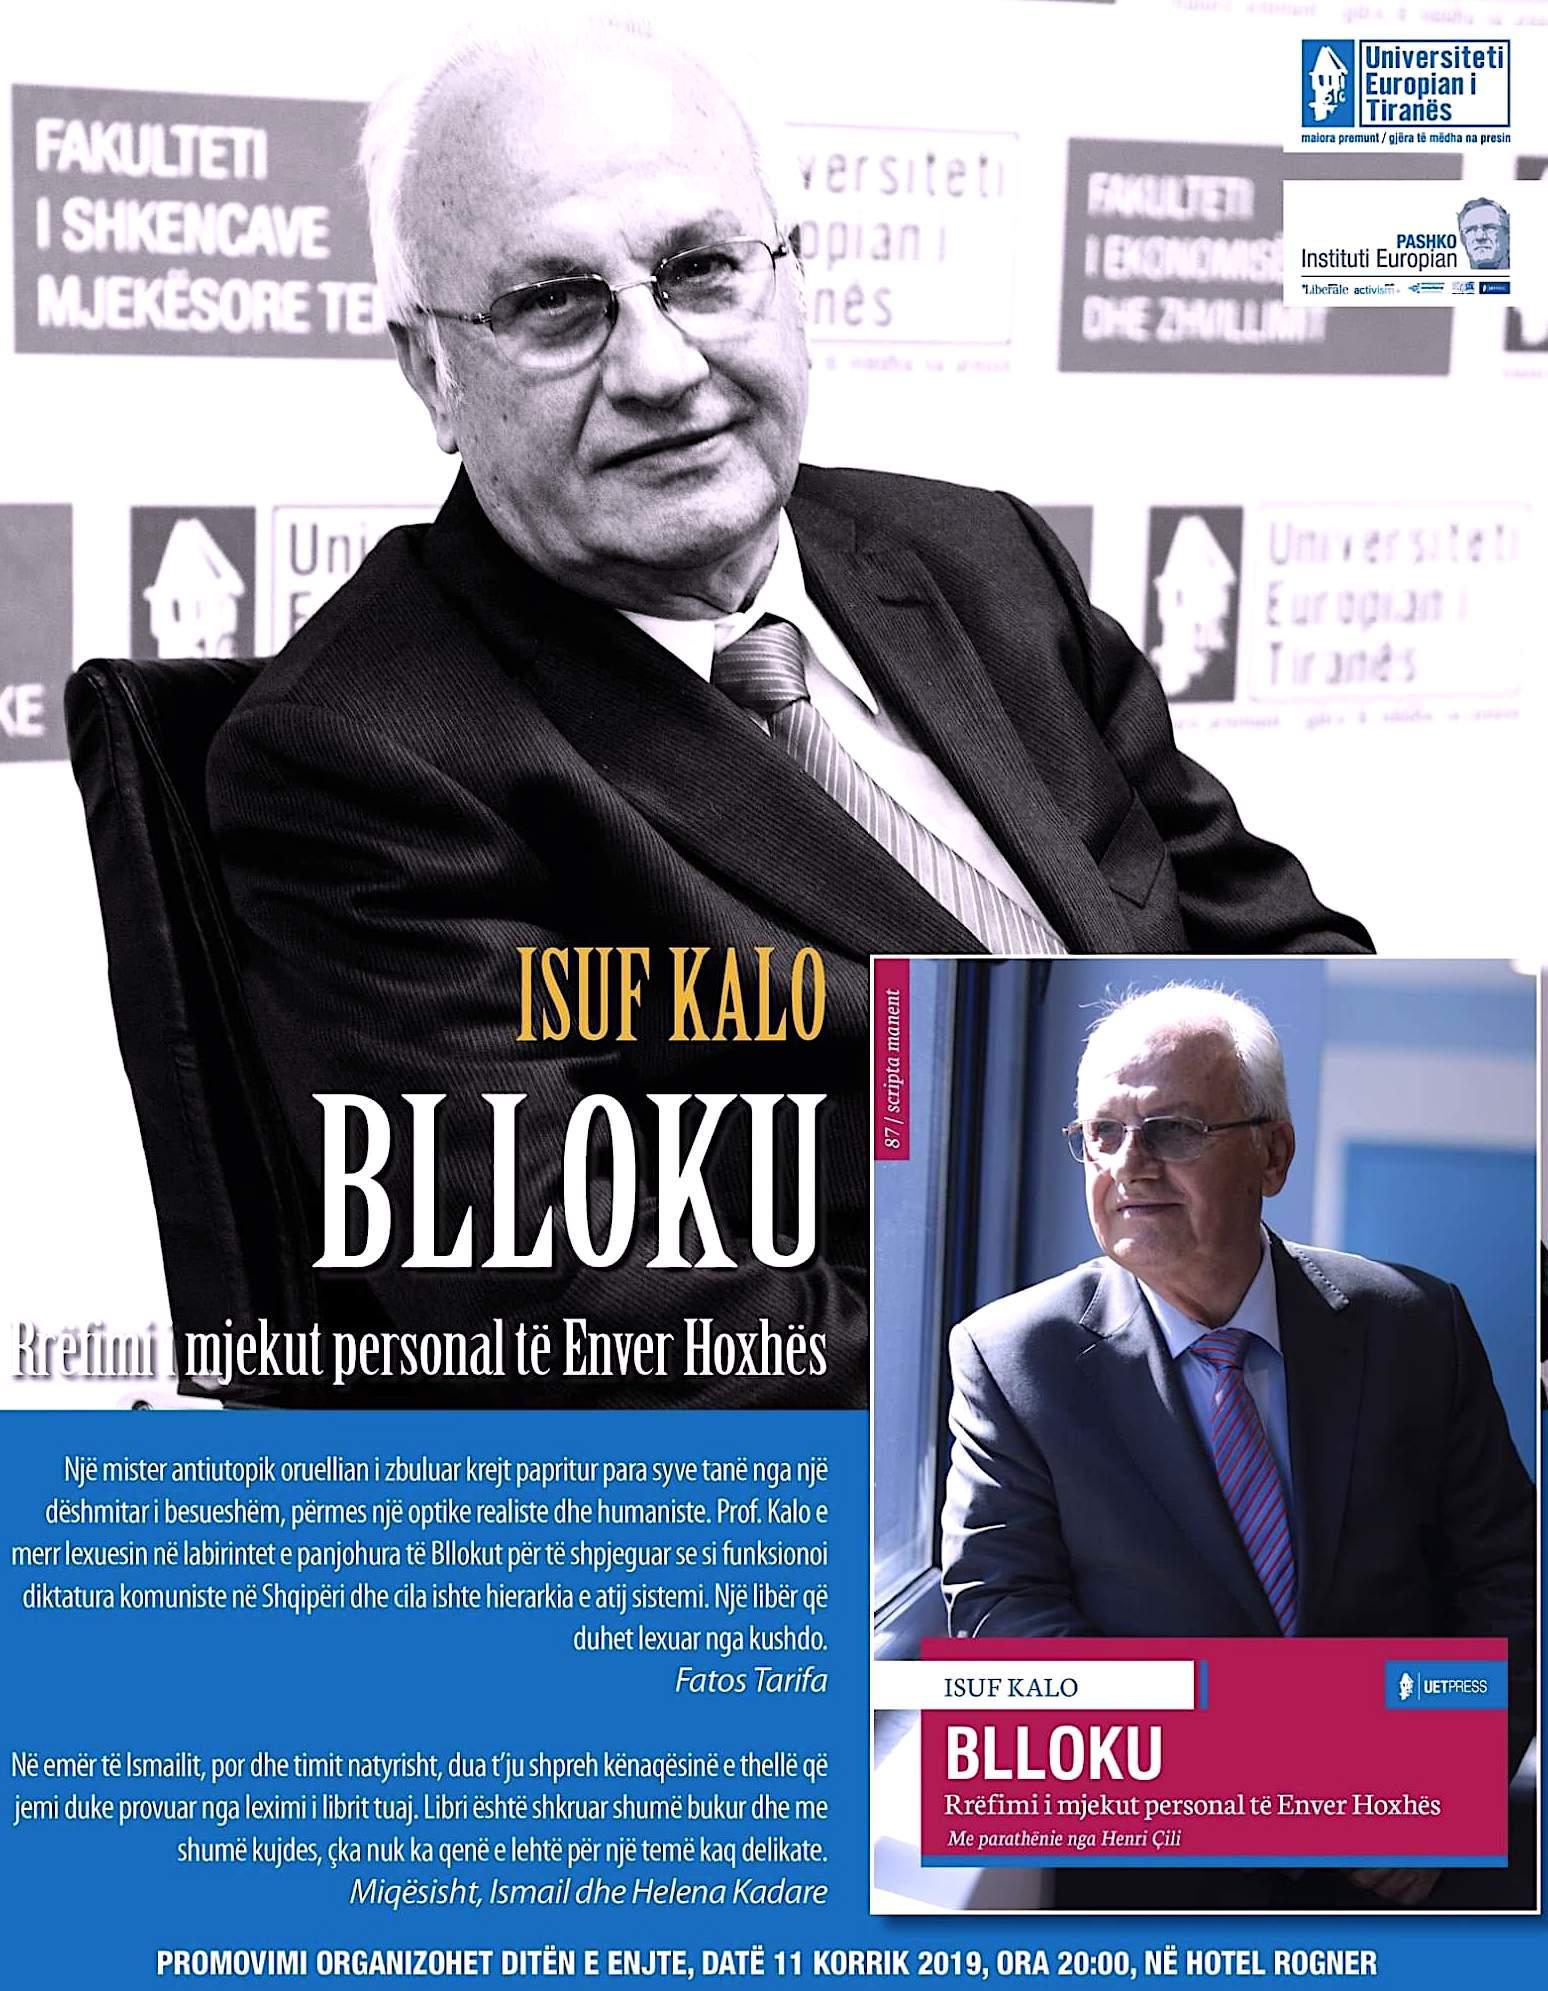 Blloku - Isuf Kalo